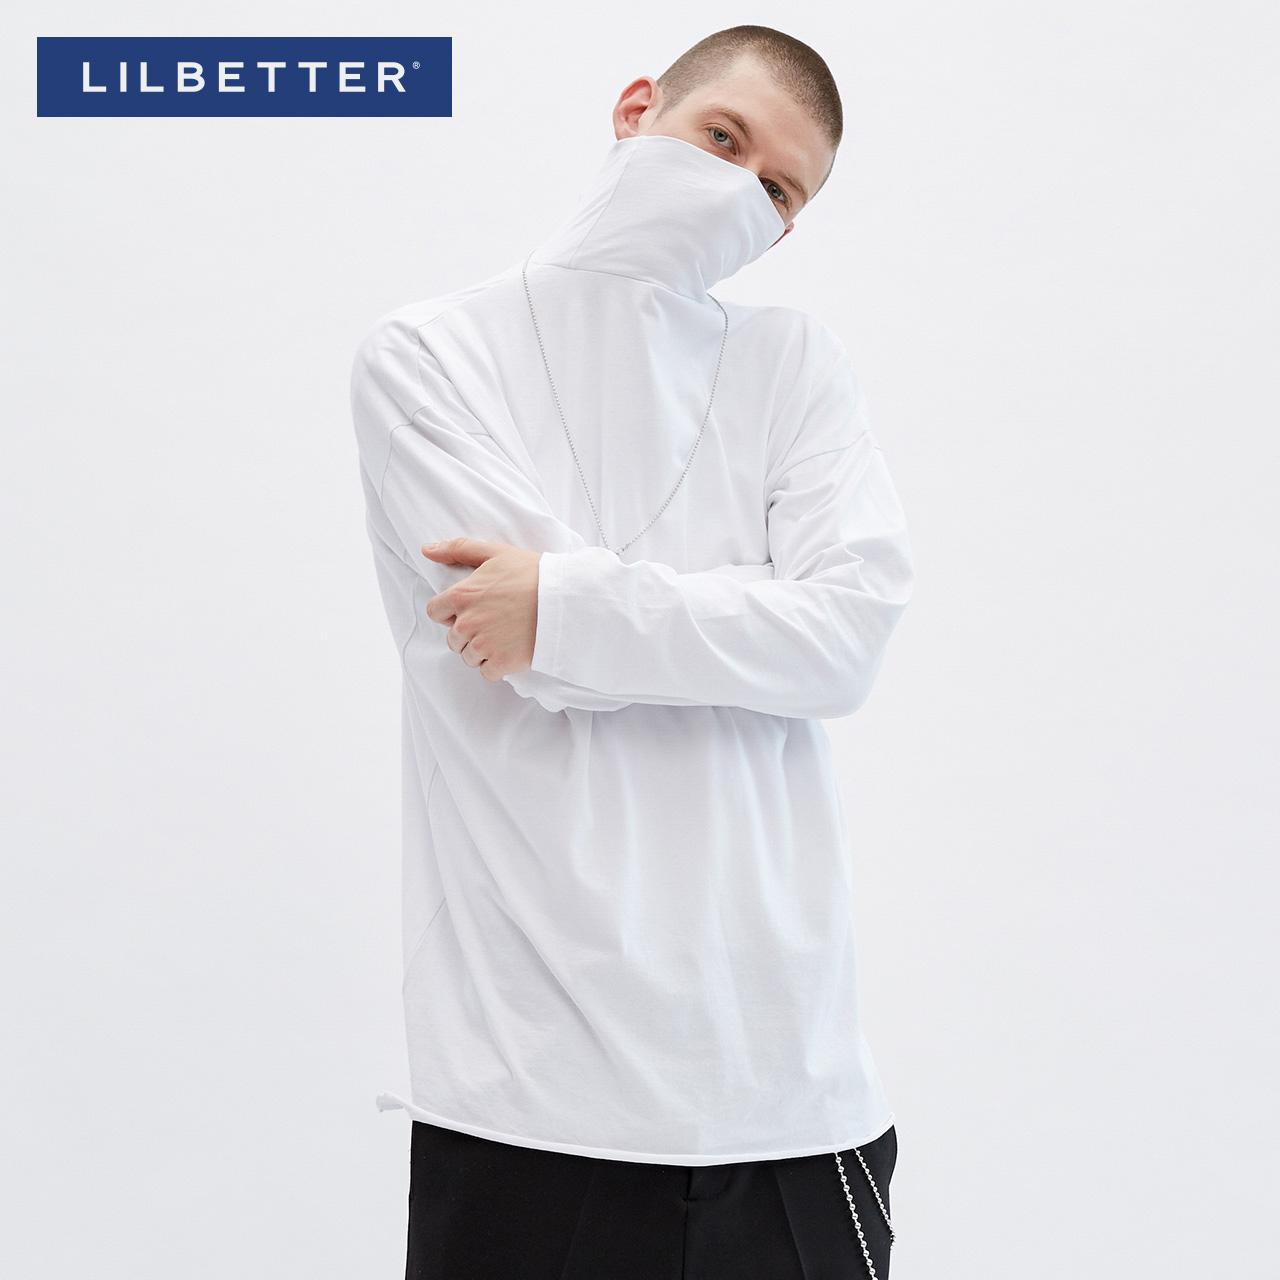 Lilbetter打底衫男春裝長袖T恤高領純色百搭 潮男上衣體恤男LB